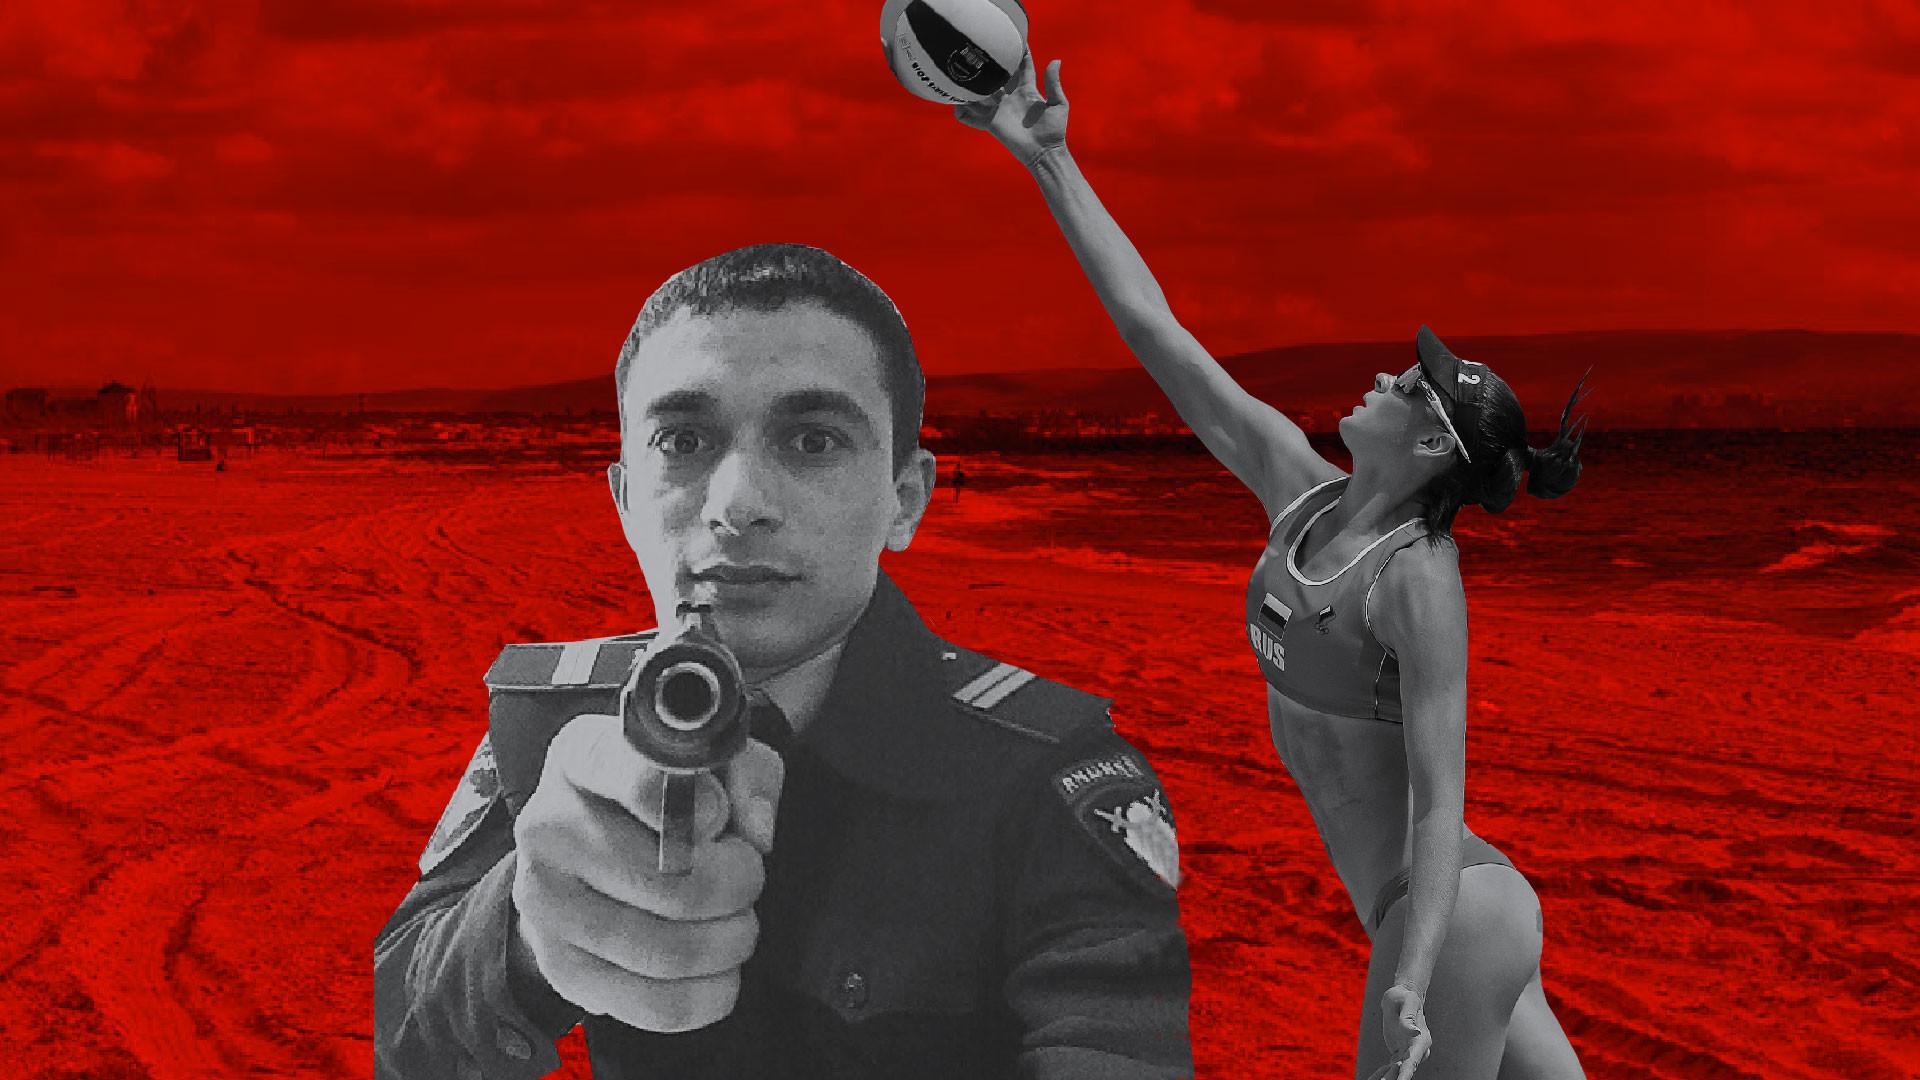 "<p>Коллаж © LIFE. Фото © <a href=""https://ok.ru/profile/570924929987"" target=""_self"">OK / Рустам Наниз</a>, ©Buda Mendes / Getty Images</p>"